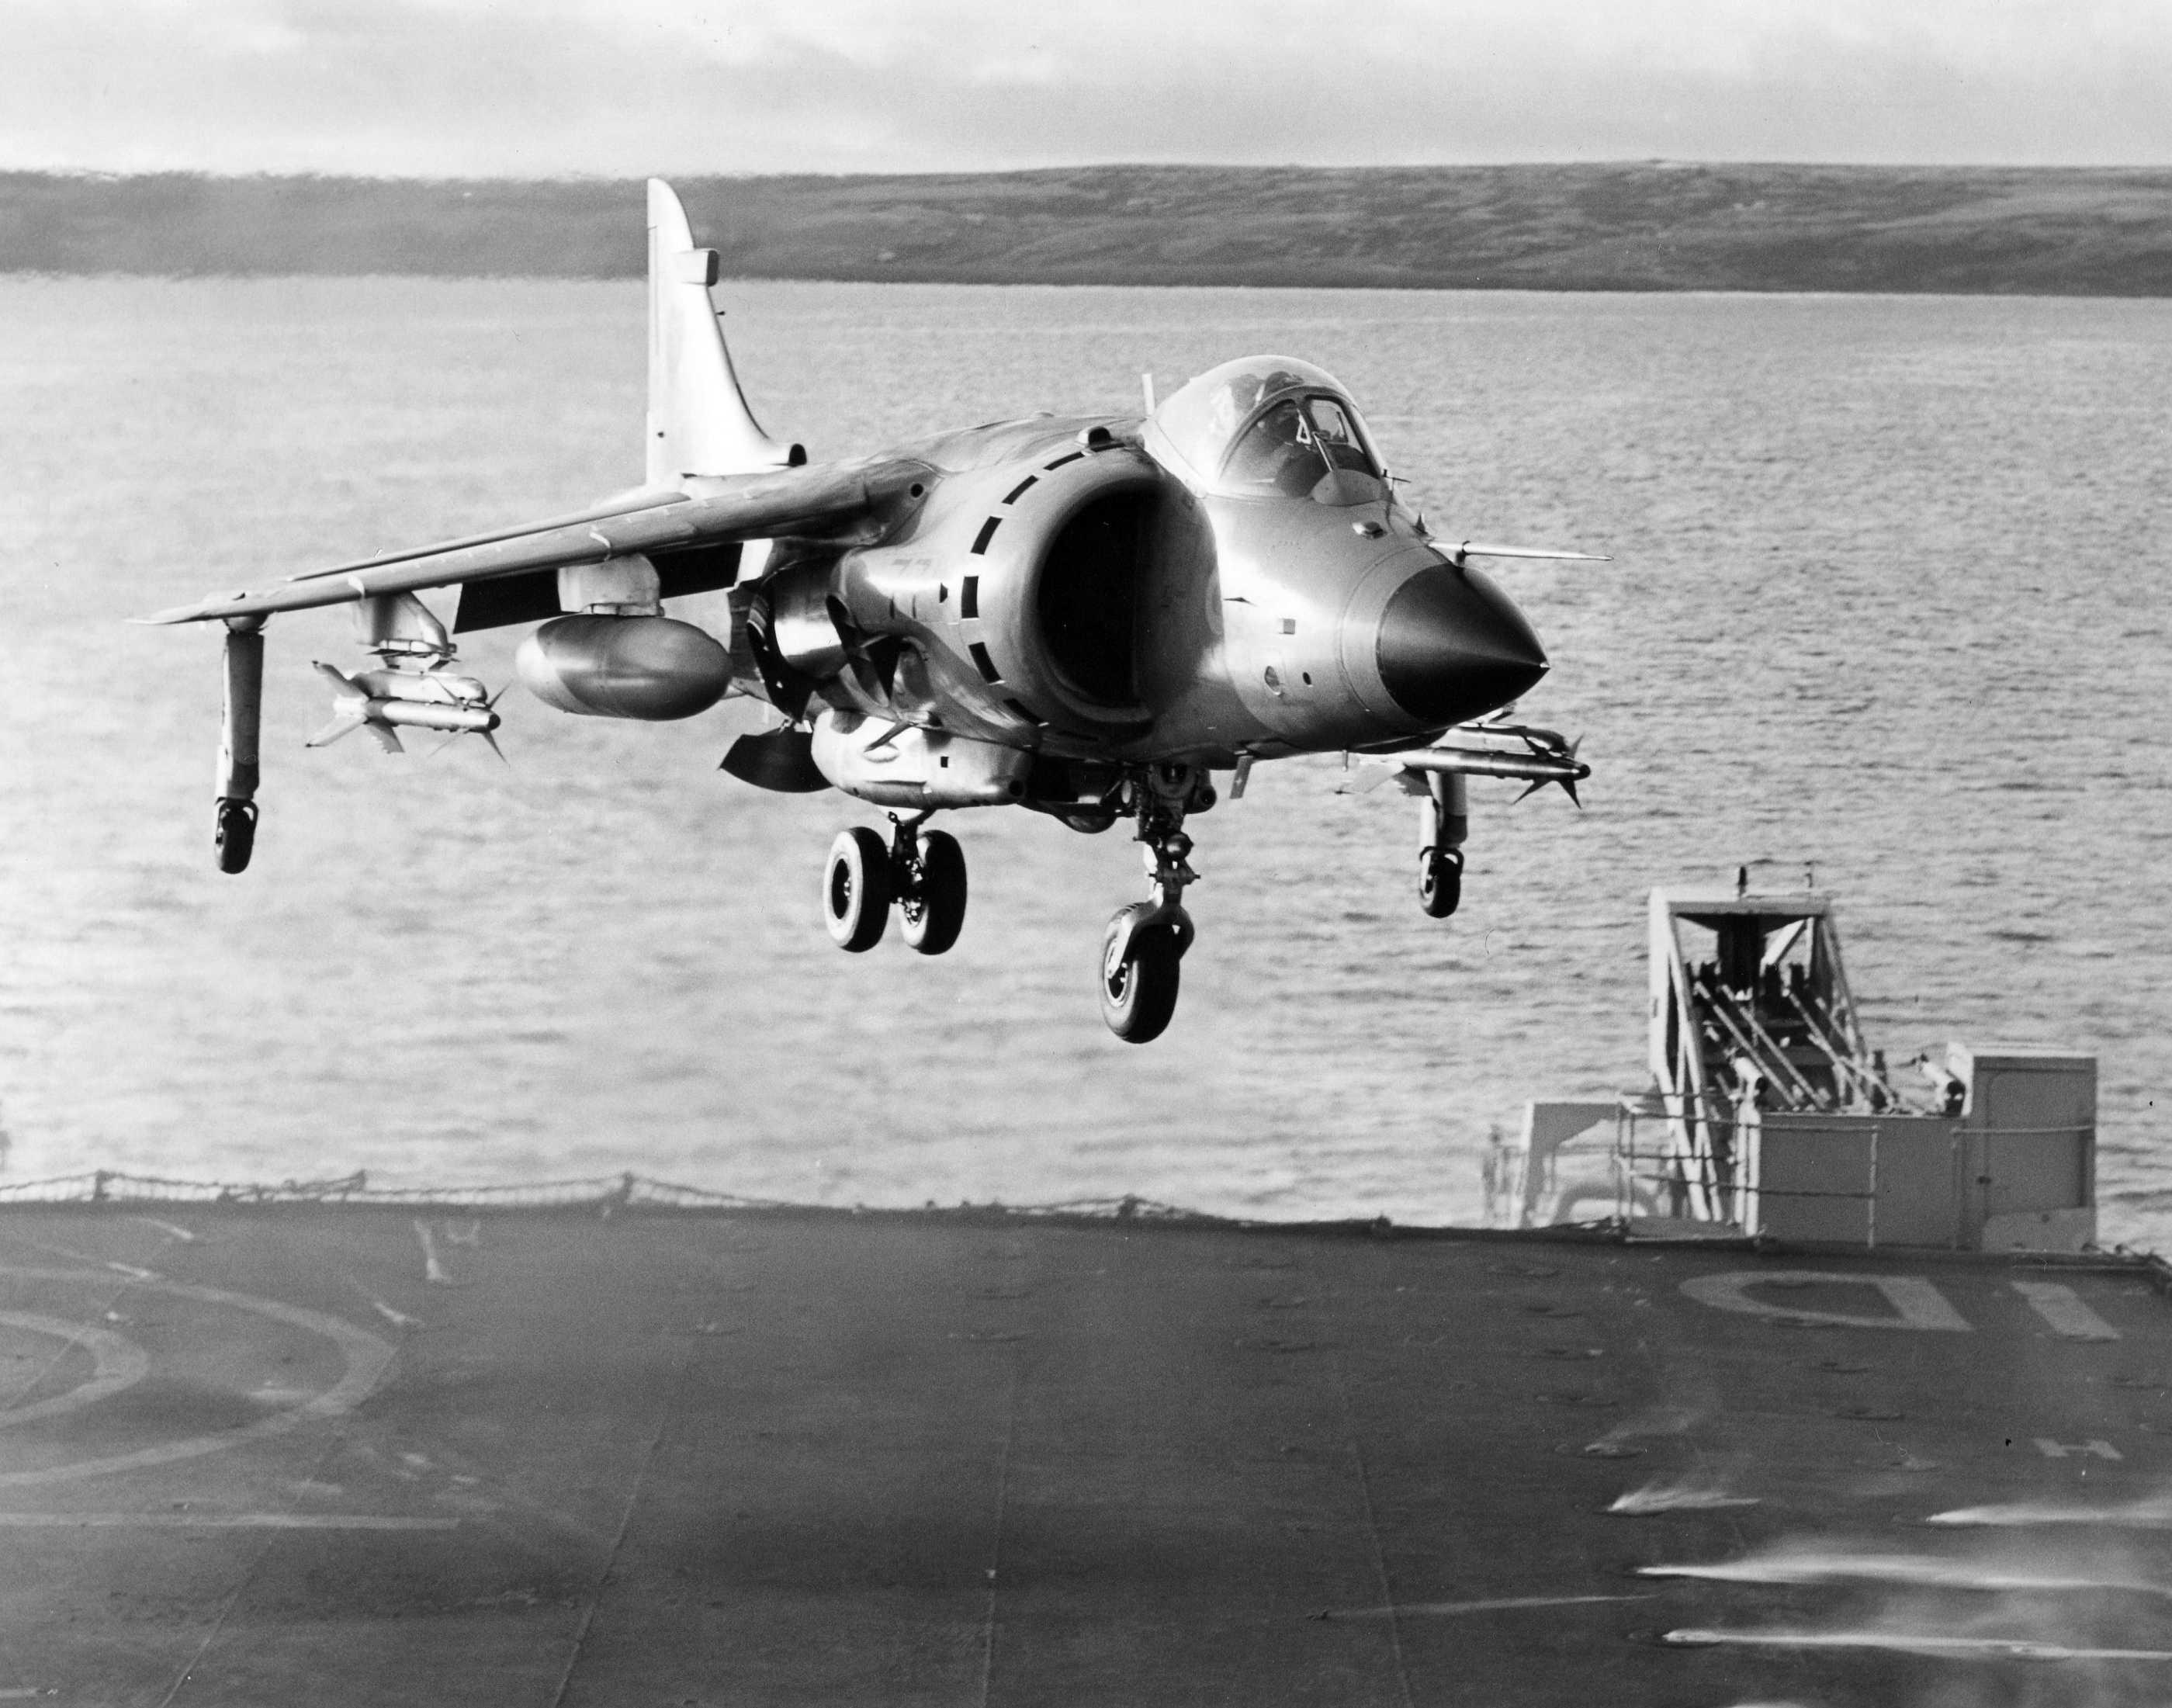 YellowAirplanecom Aircraft of the Falkland Islands